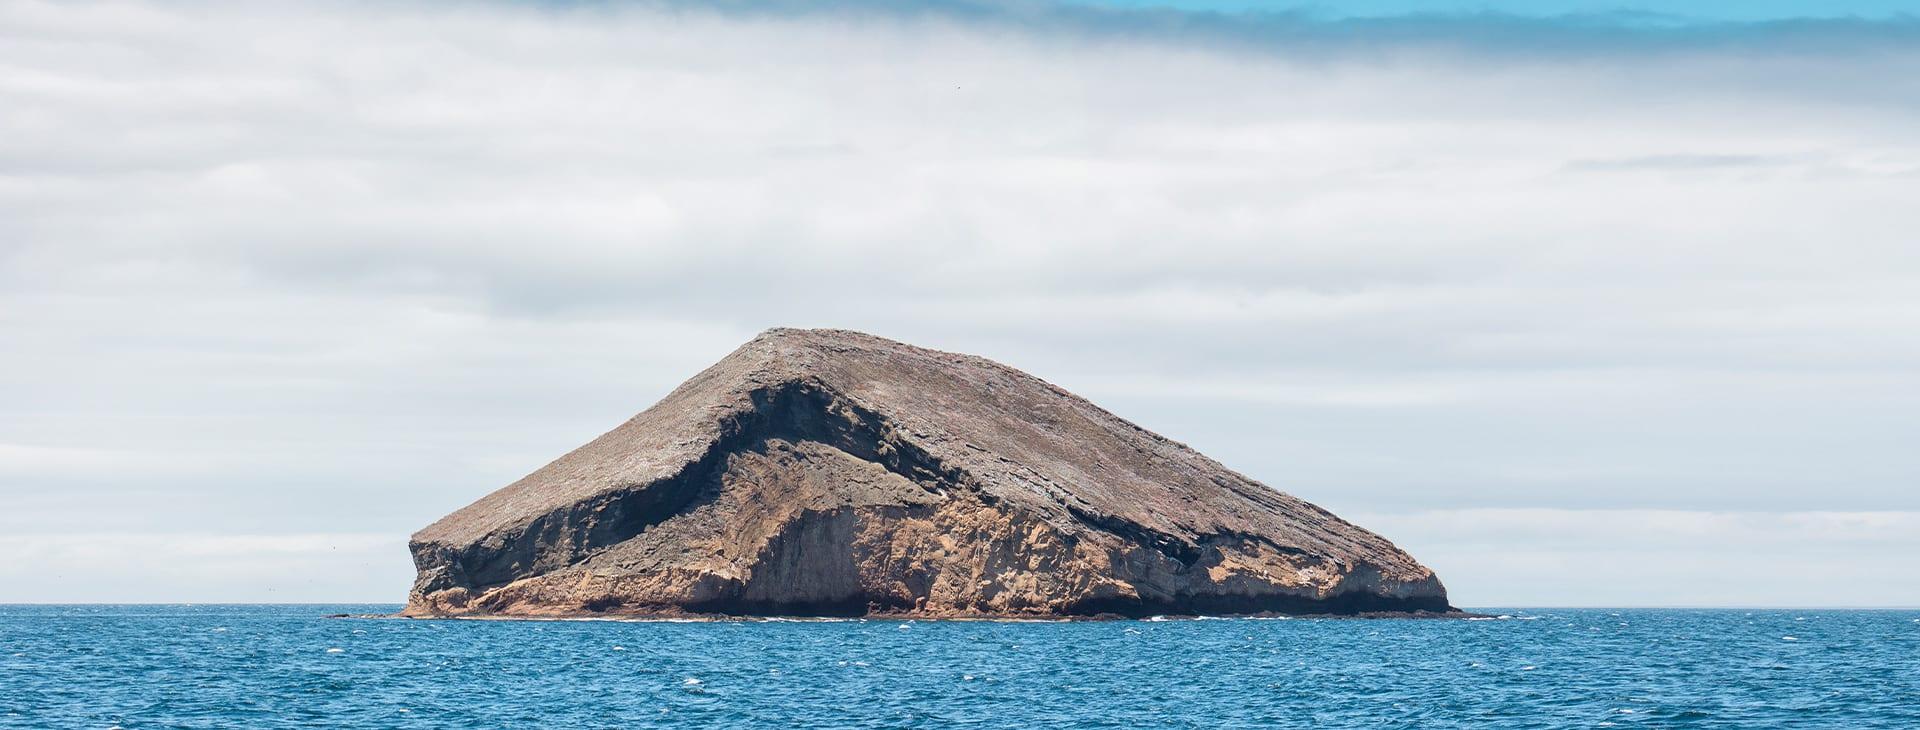 galapagos island in distance